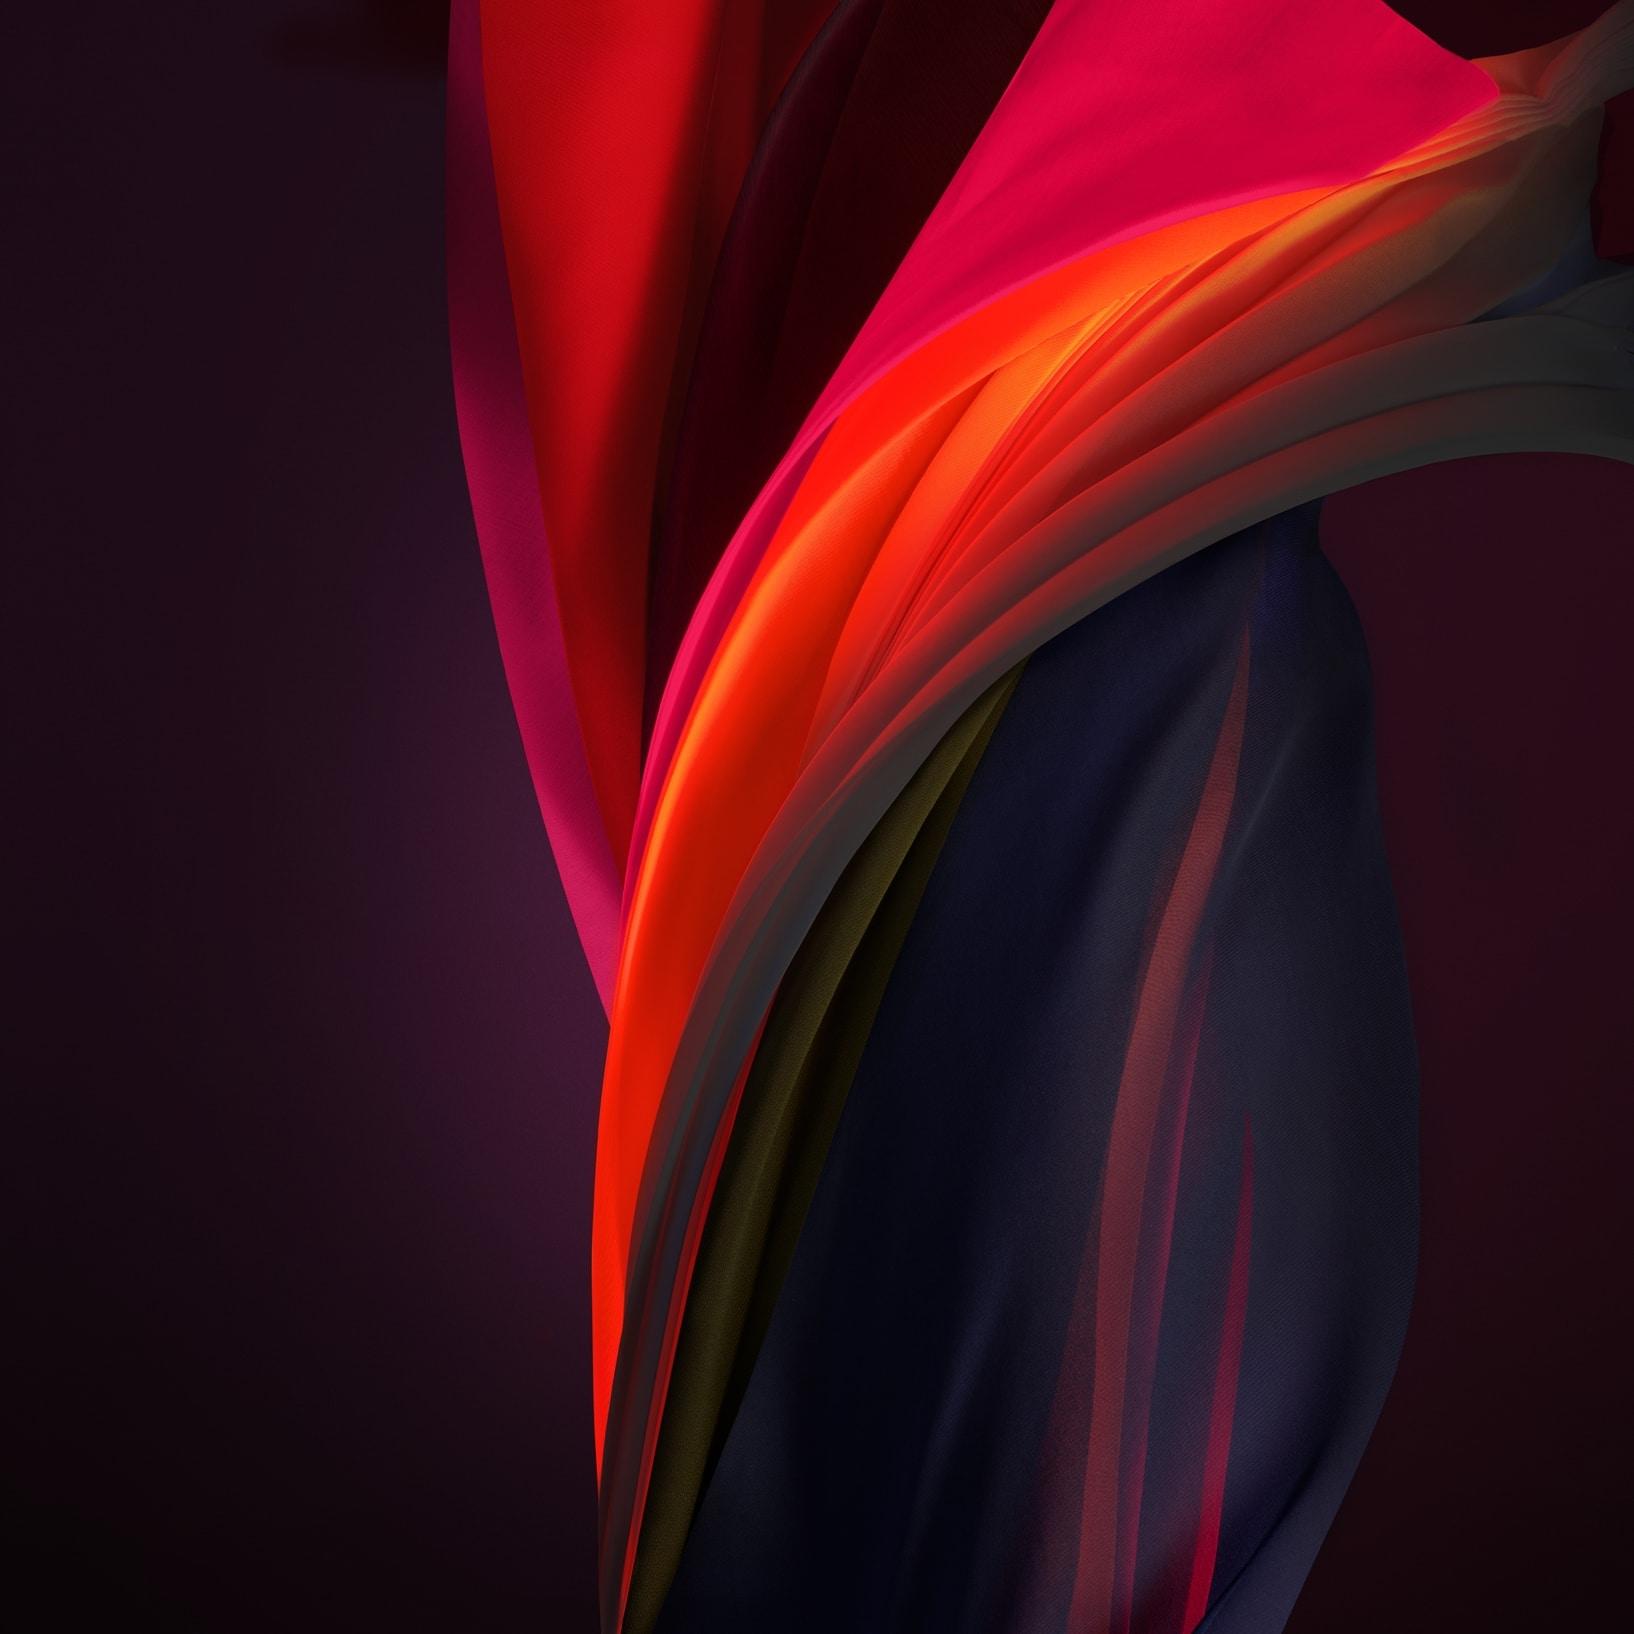 Silk_Purple_Dark- iPhone SE 2020 - TechFoogle